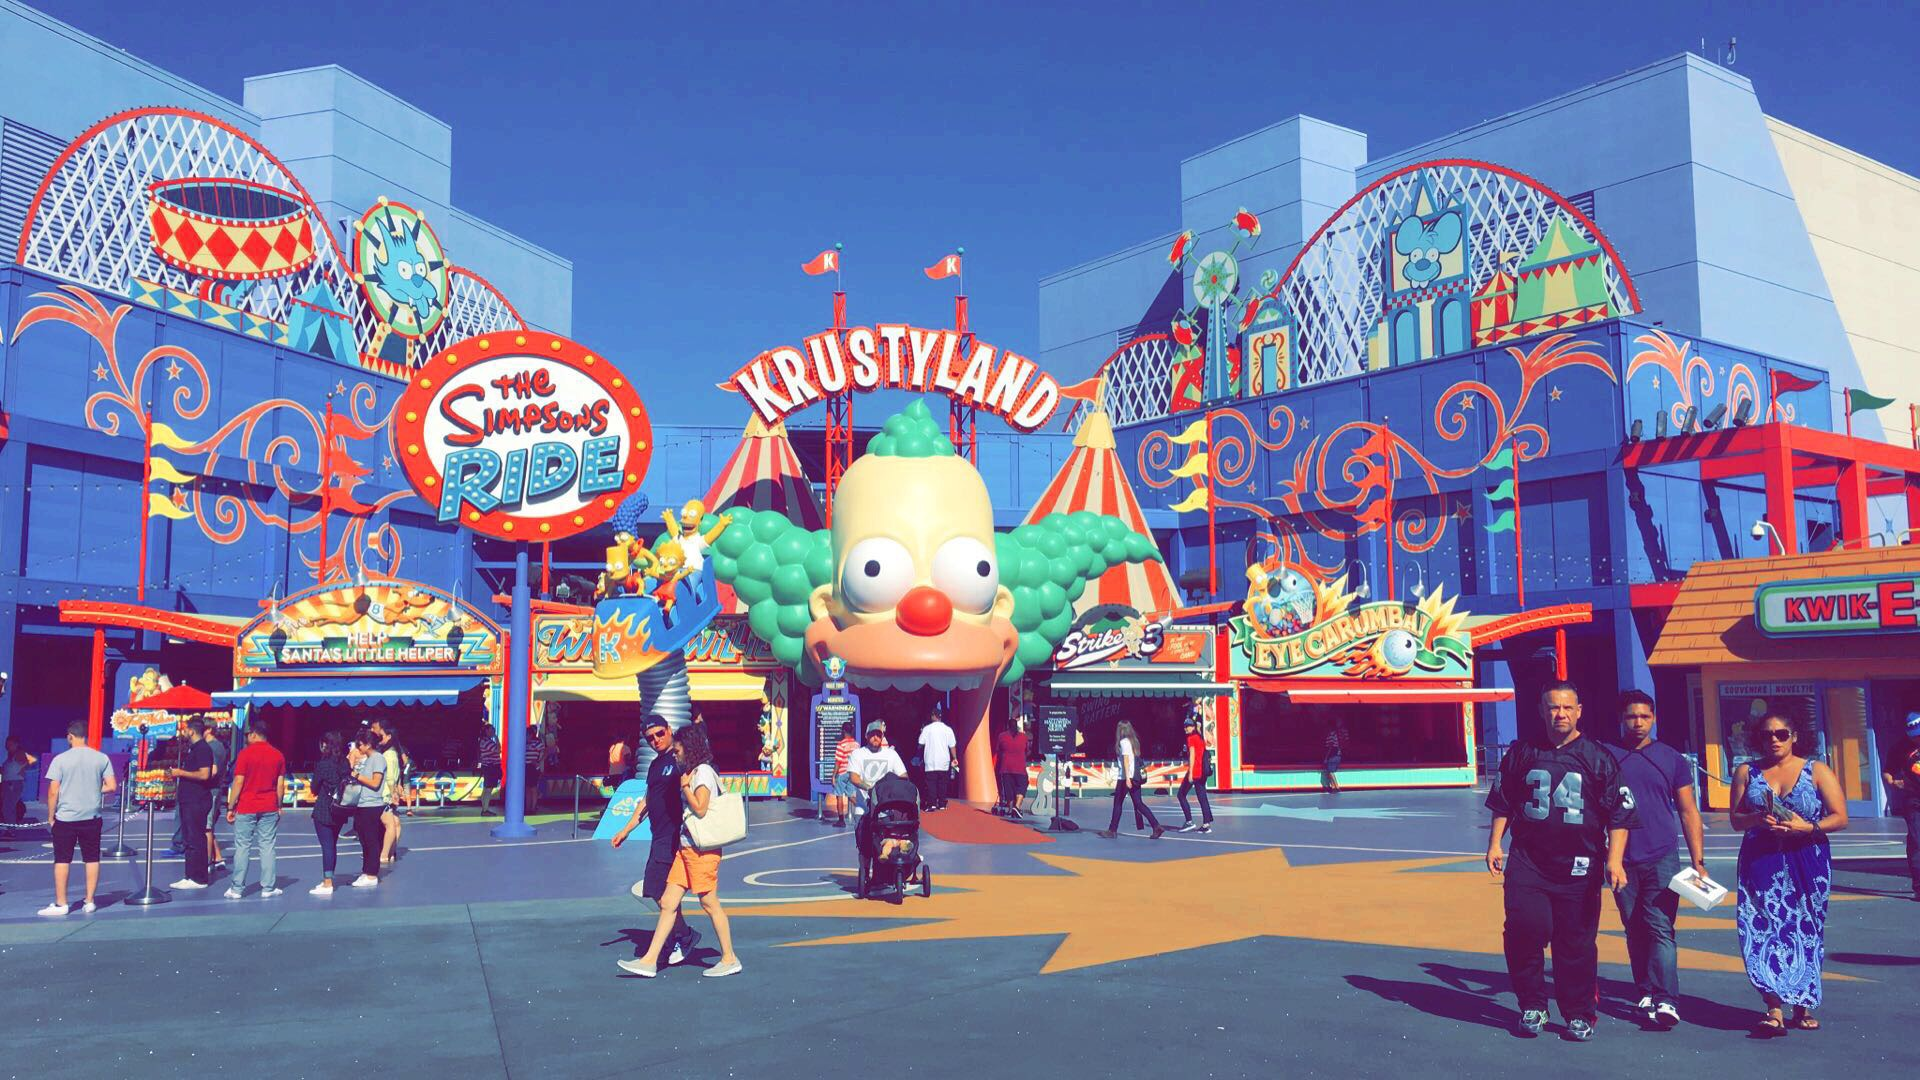 Best Movie La La Land Wallpaper Hd - Universal Studios Hollywood, The Simpsons Ride , HD Wallpaper & Backgrounds